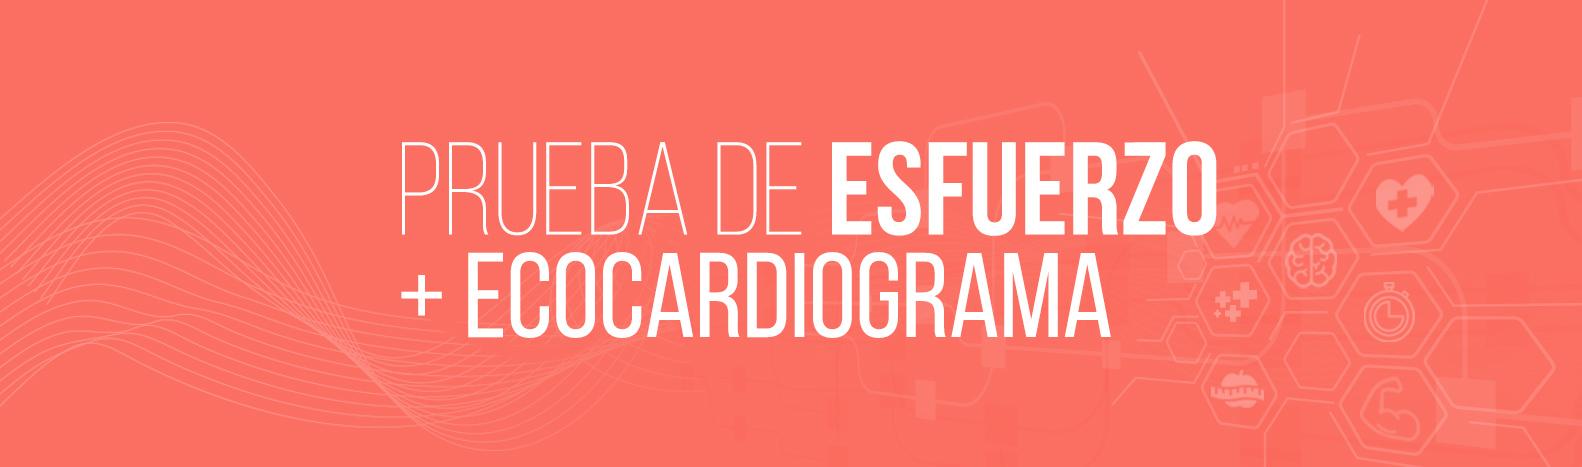 Prueba de esfuerzo + Ecocardiograma